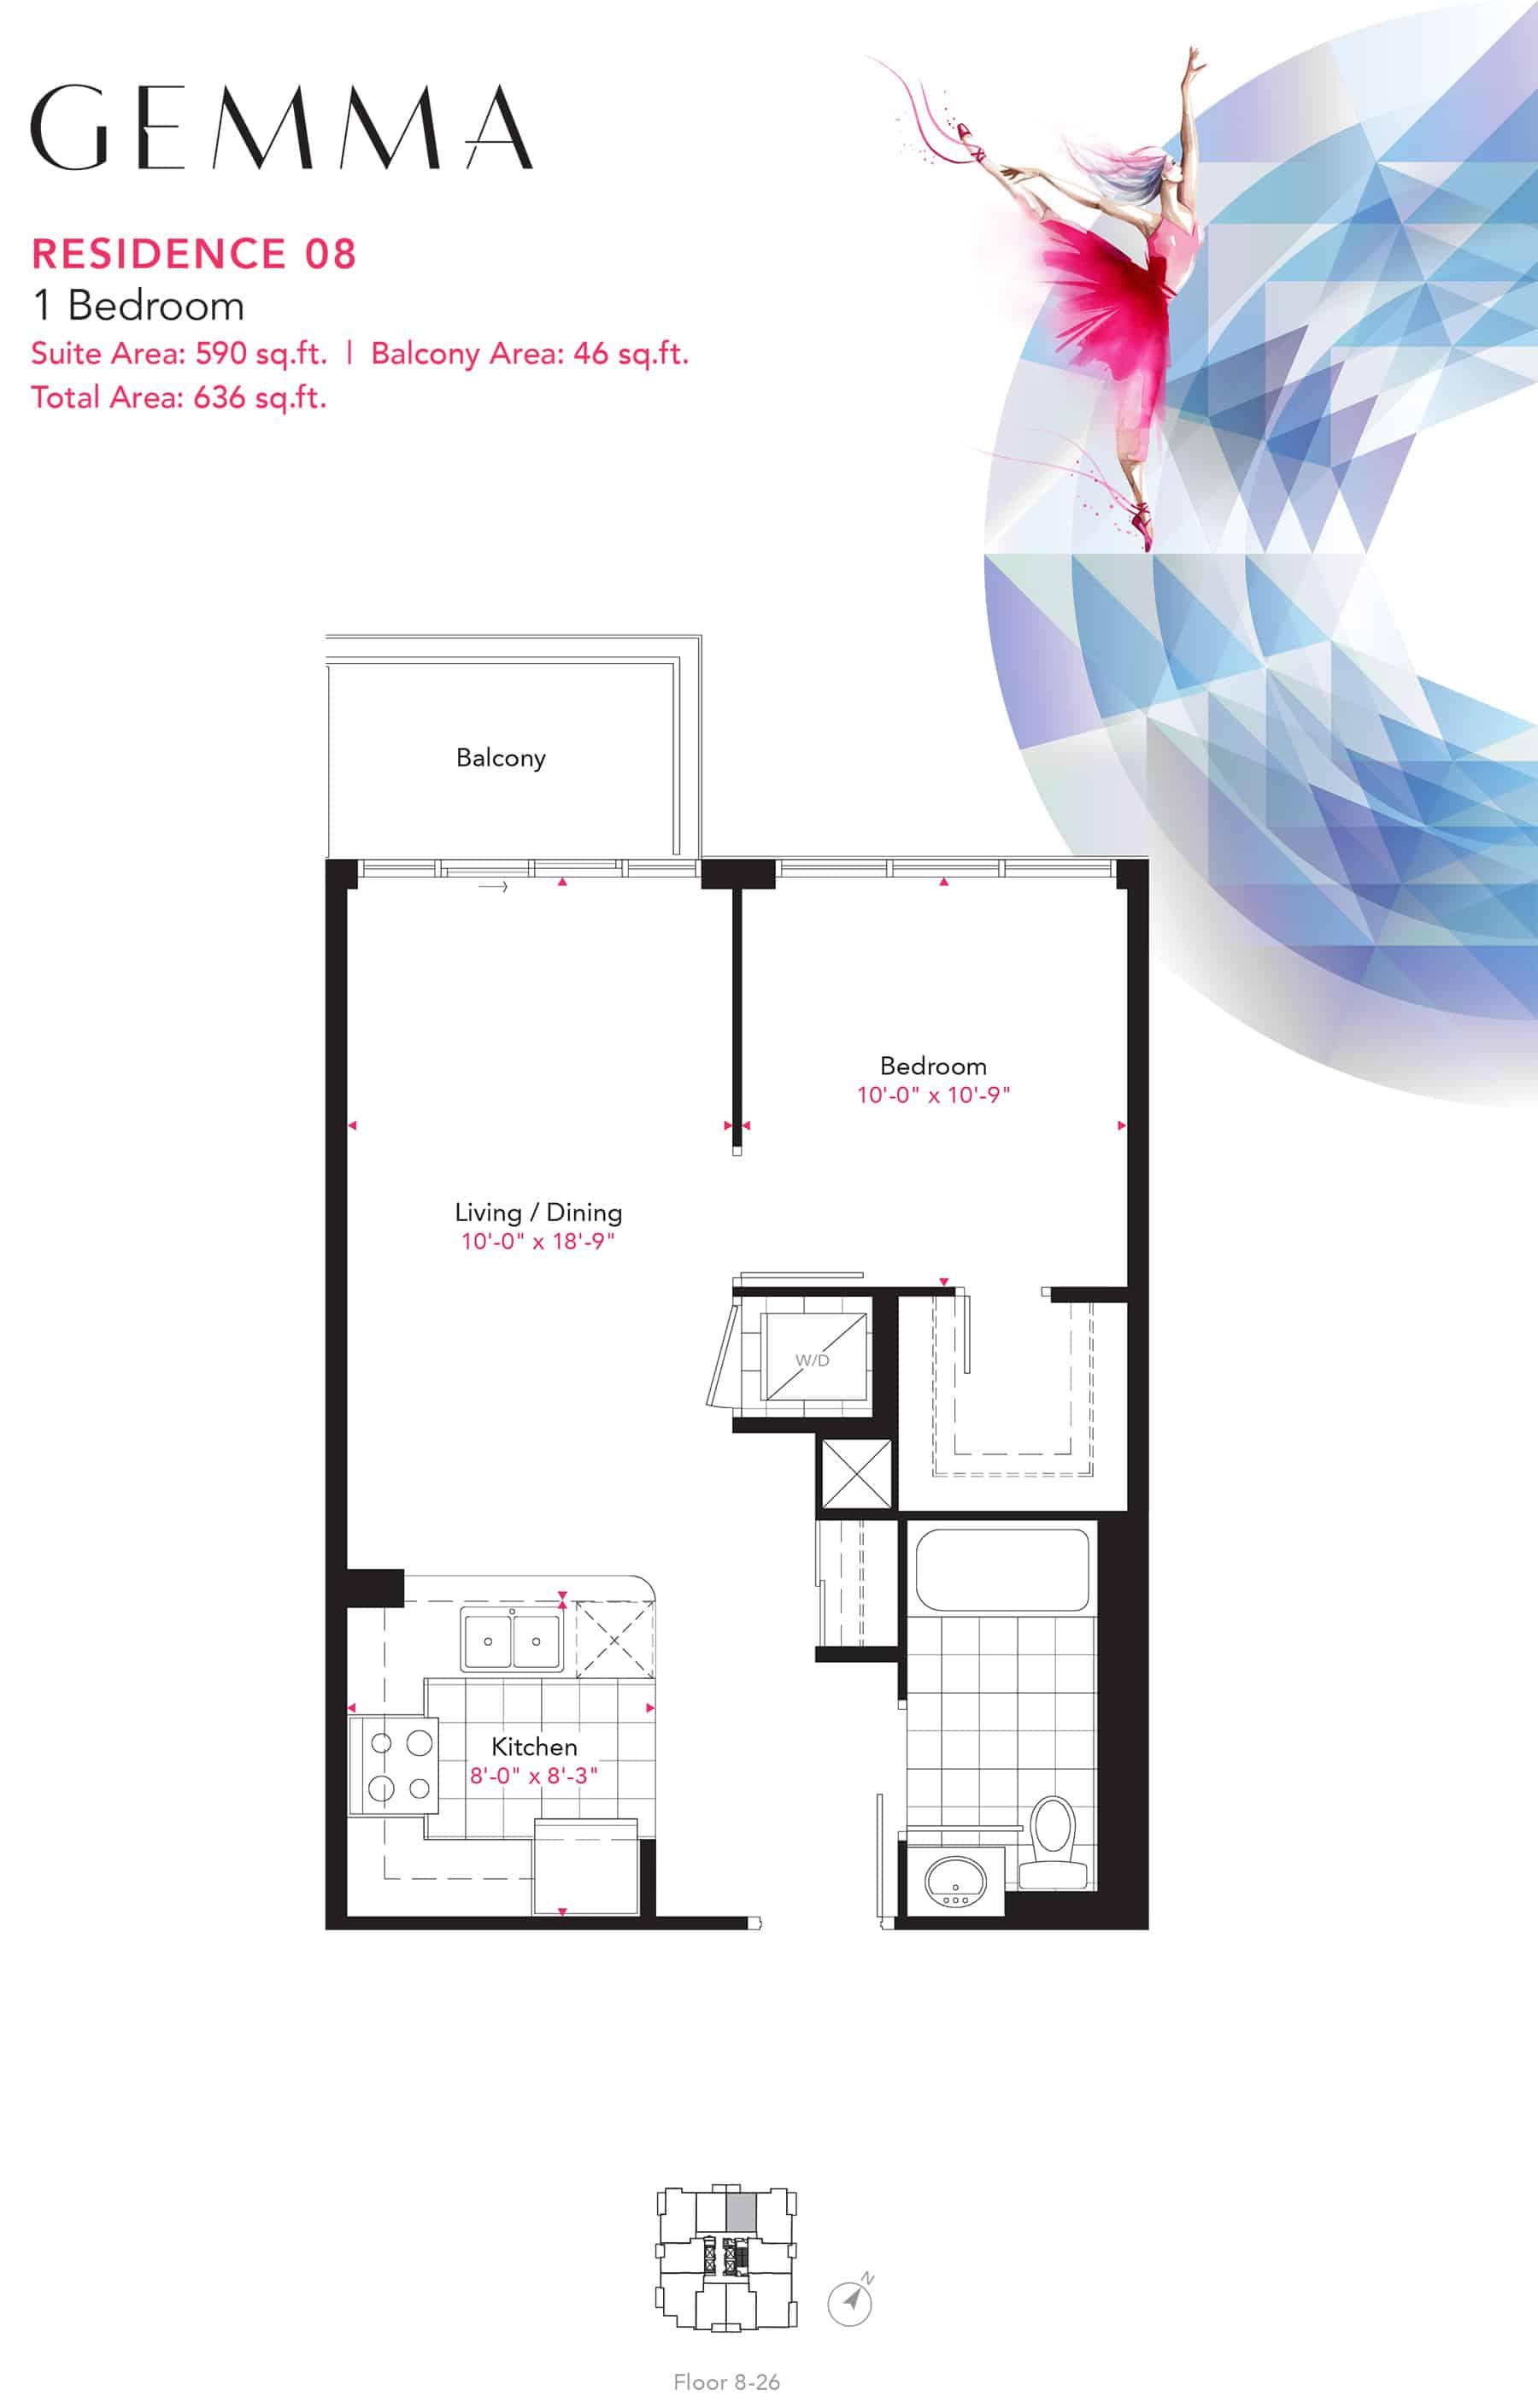 Residence-08-1B-590-Sqft-Gemma  Gemma Condos Residence 08 1B 590 Sqft Gemma